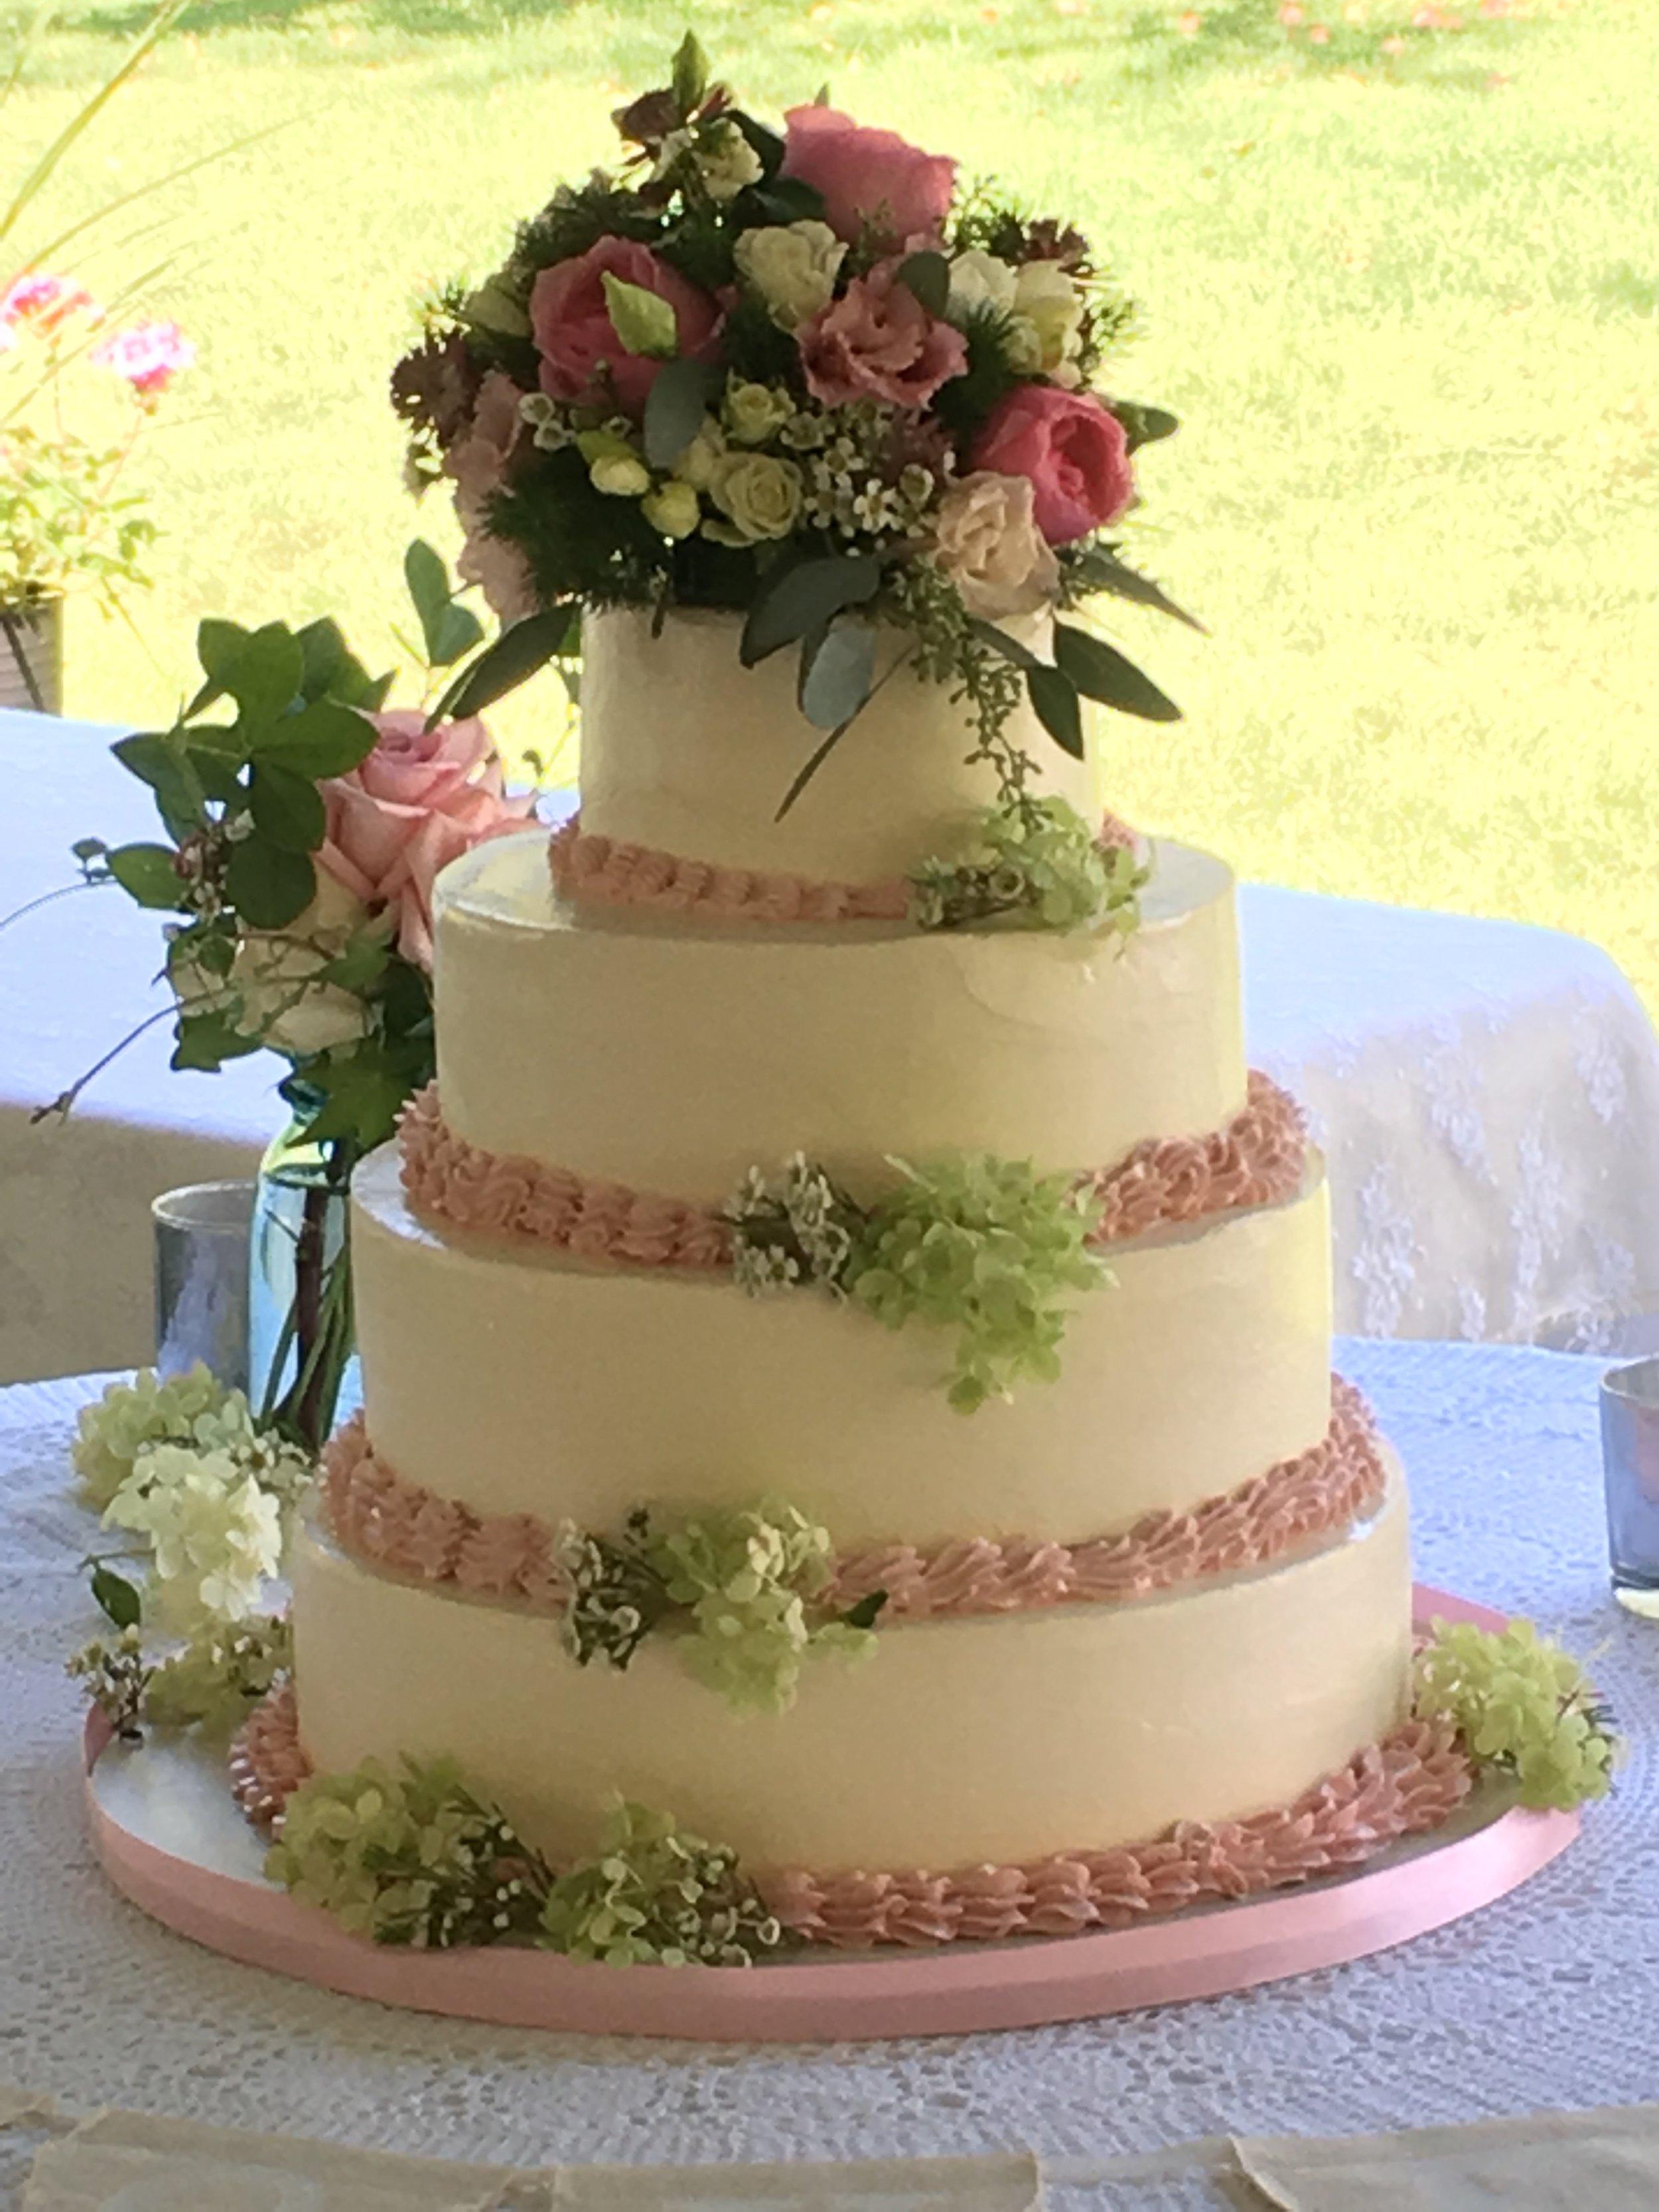 Hillary's wedding cake